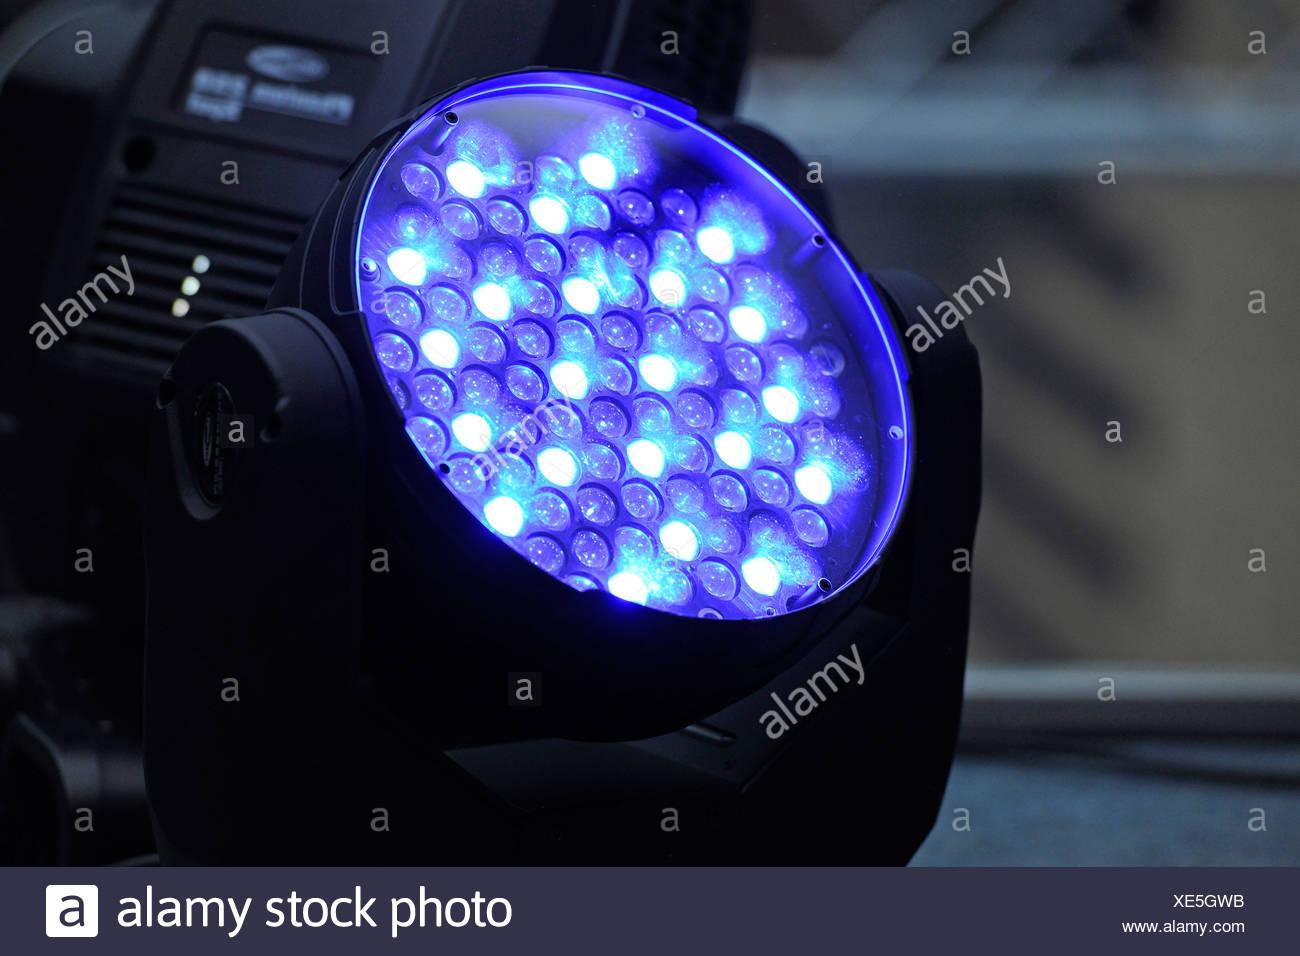 Event lighting, laser light, blue lights - Stock Image